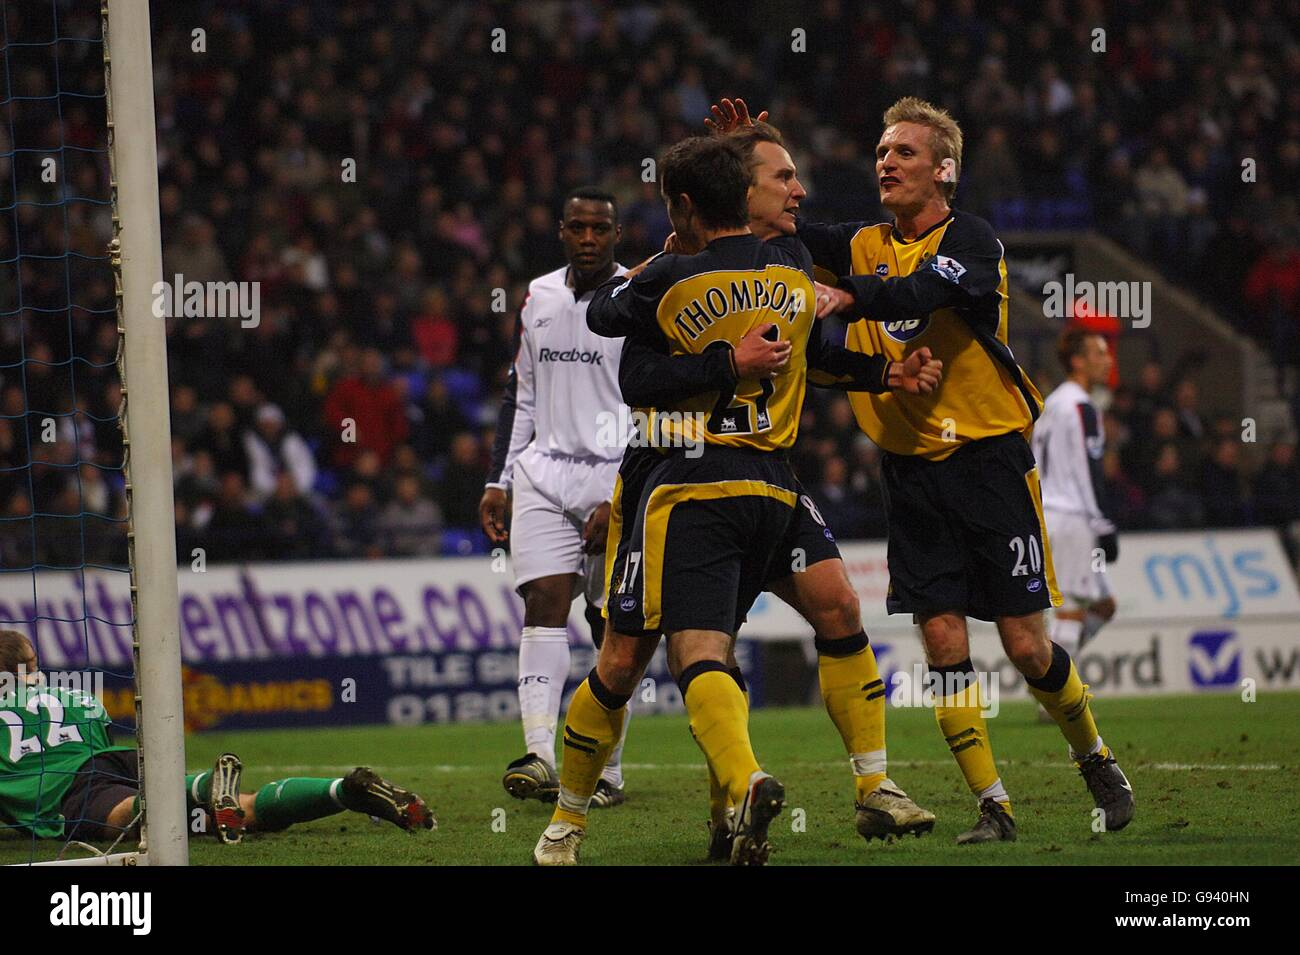 Soccer - FA Barclays Premiership - Bolton Wanderers v Wigan Athletic - Reebok Stadium Stock Photo